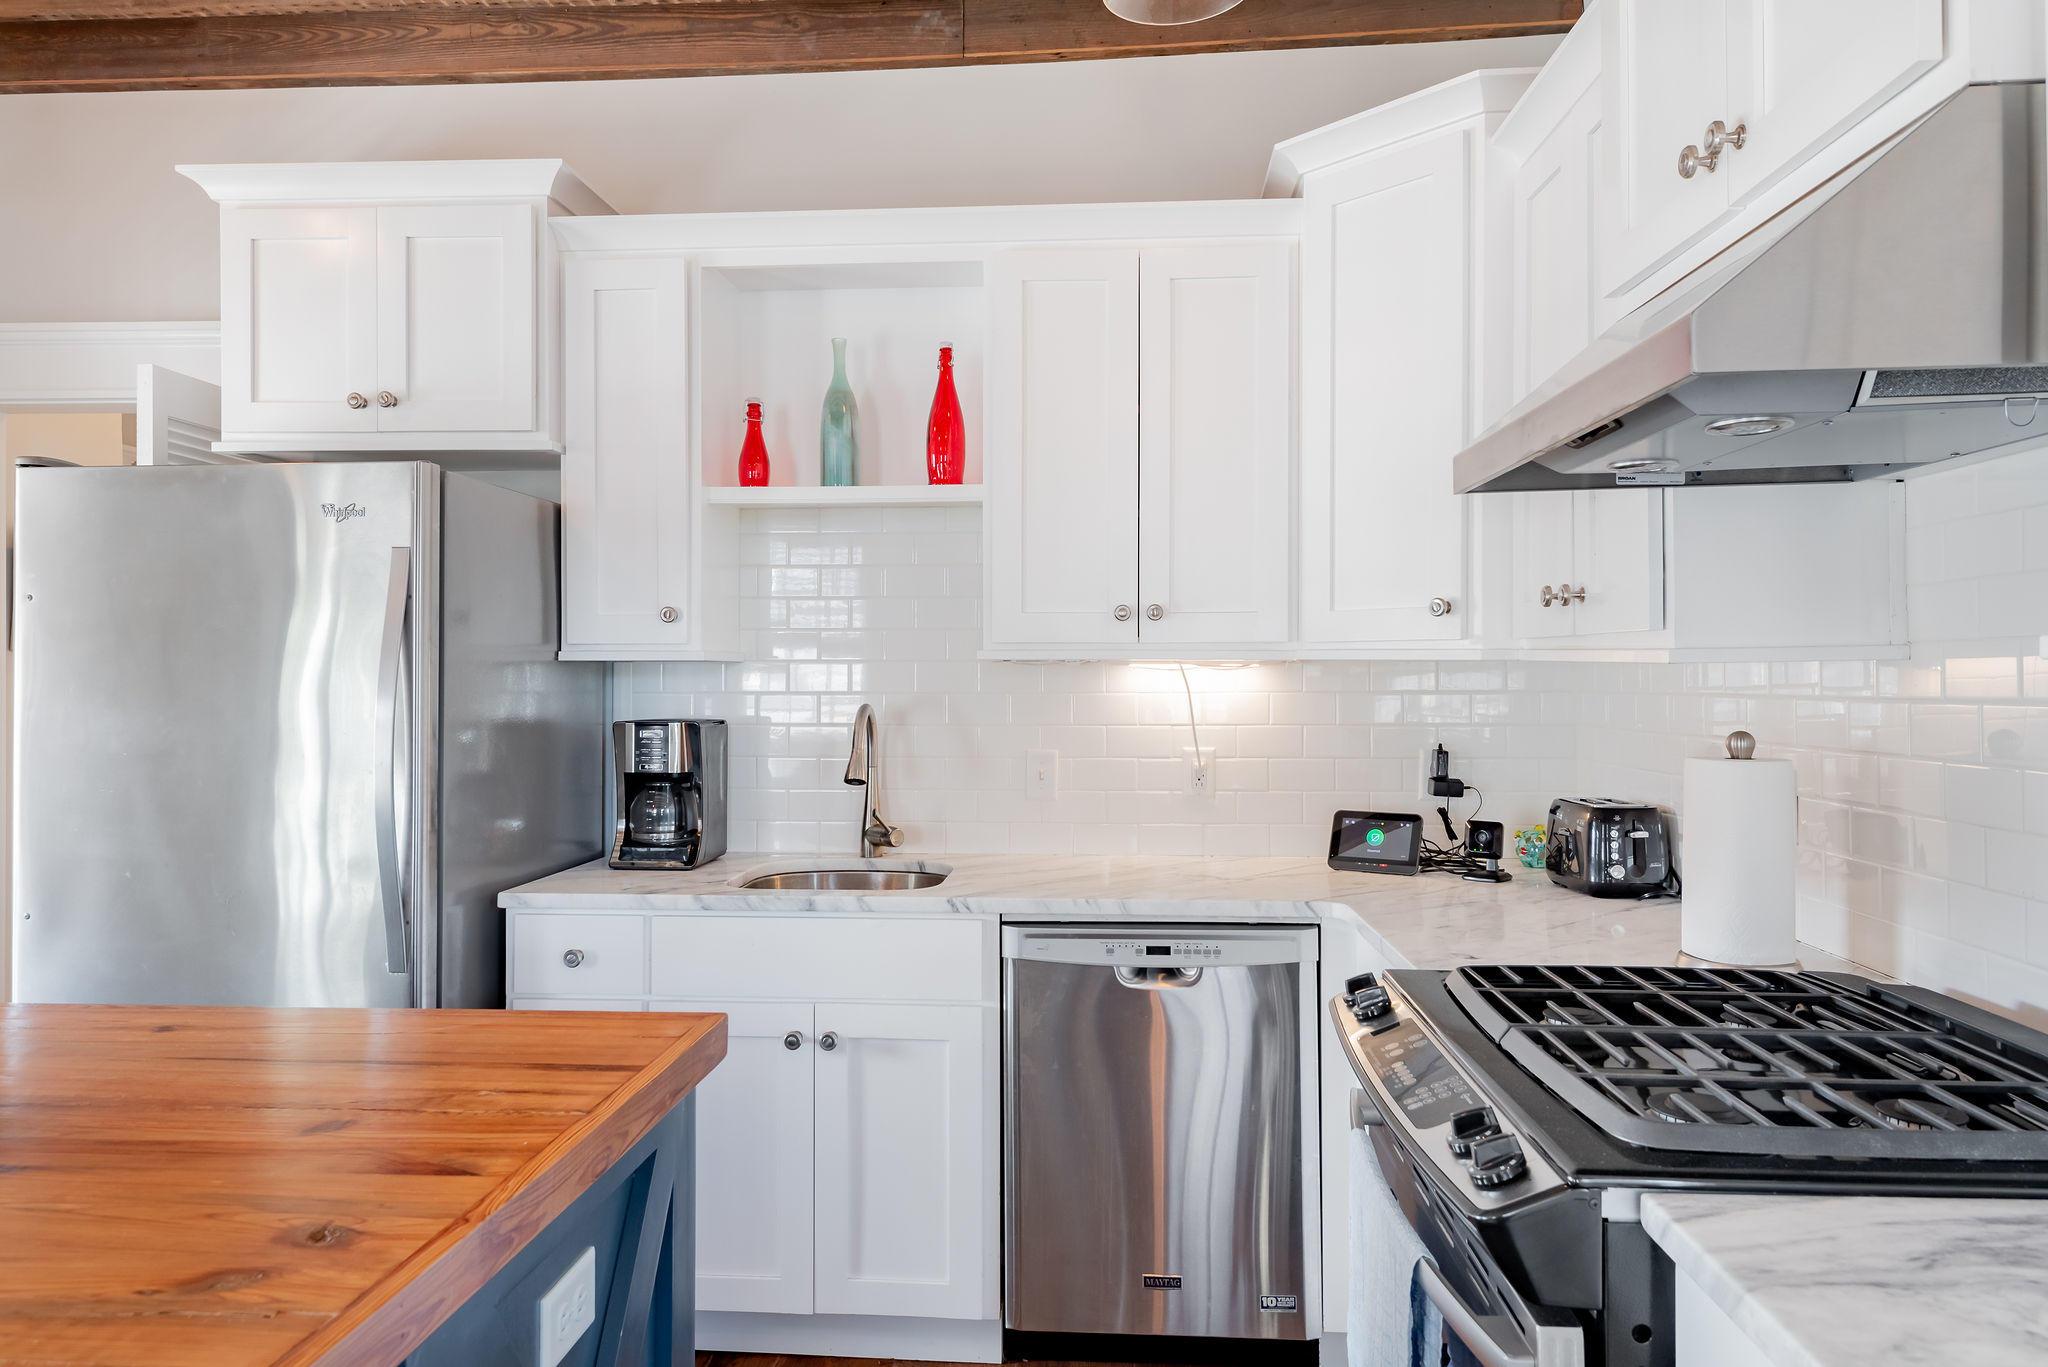 Elliotborough Homes For Sale - 29 Sires, Charleston, SC - 14